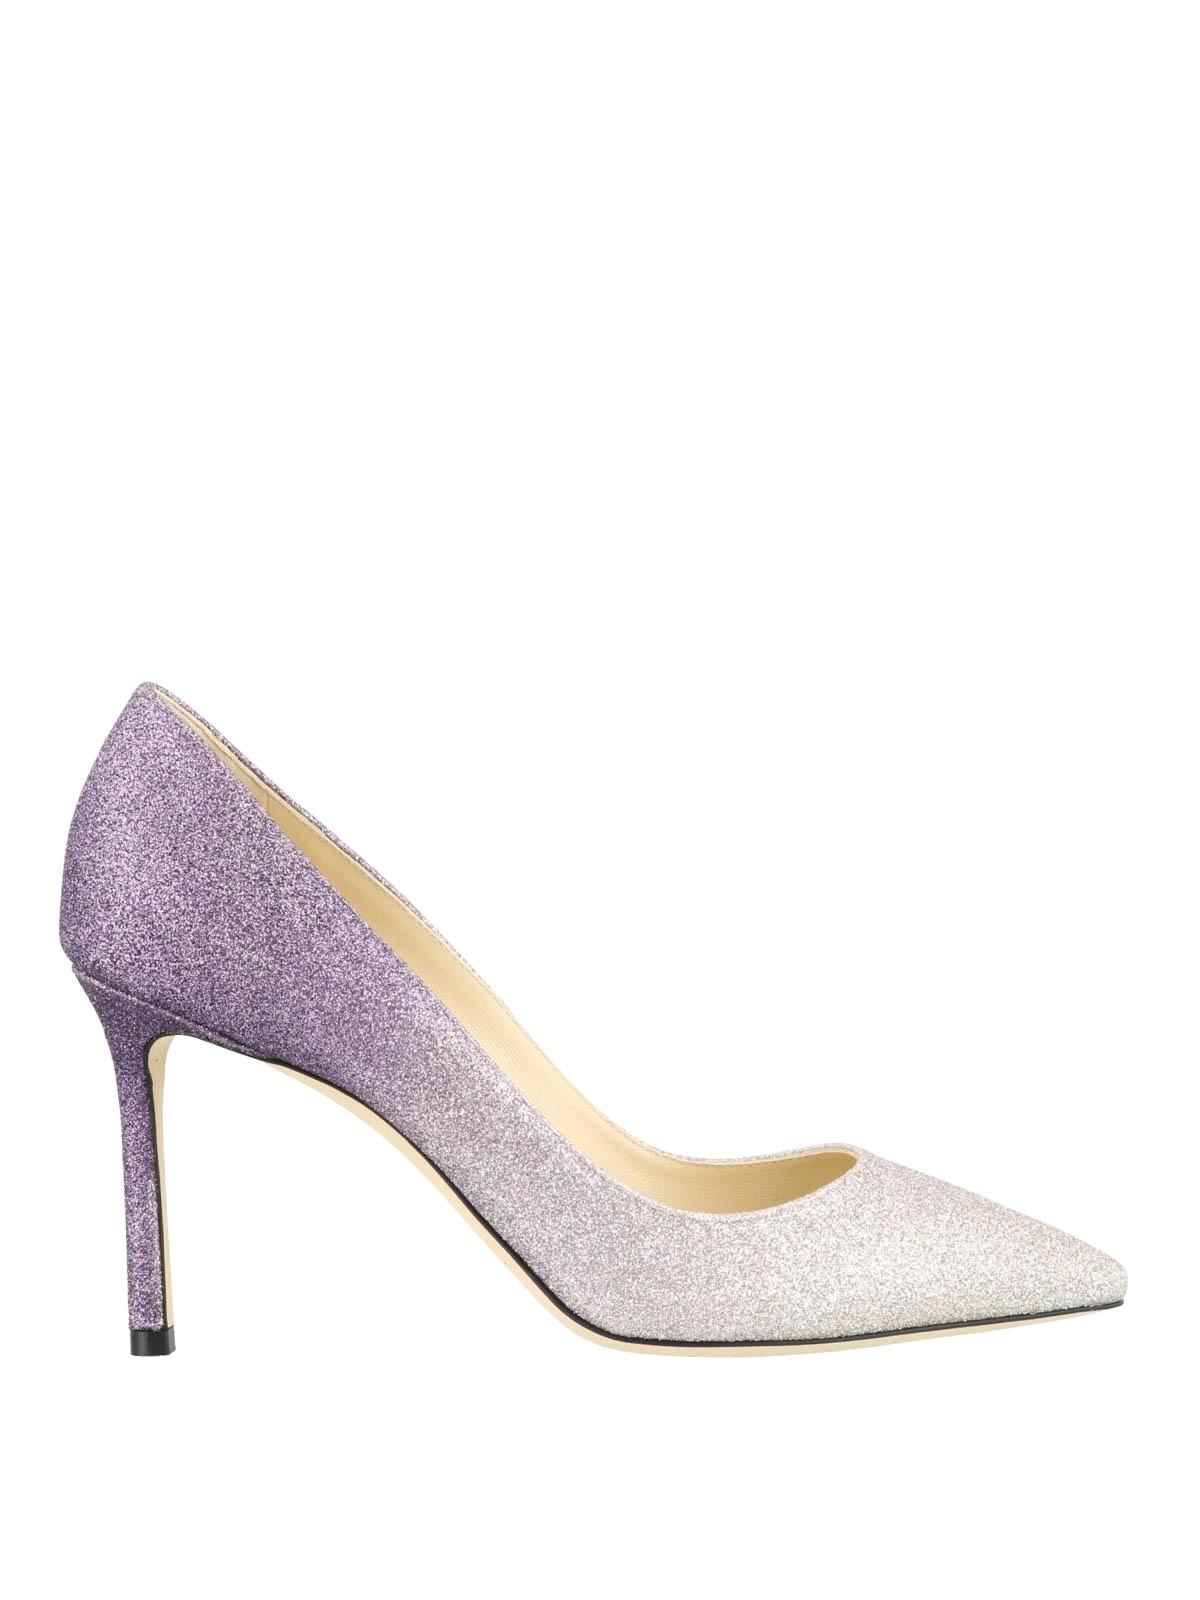 831145f0da69 Jimmy Choo - Romy 85 degrade dusty glitter pumps - court shoes ...